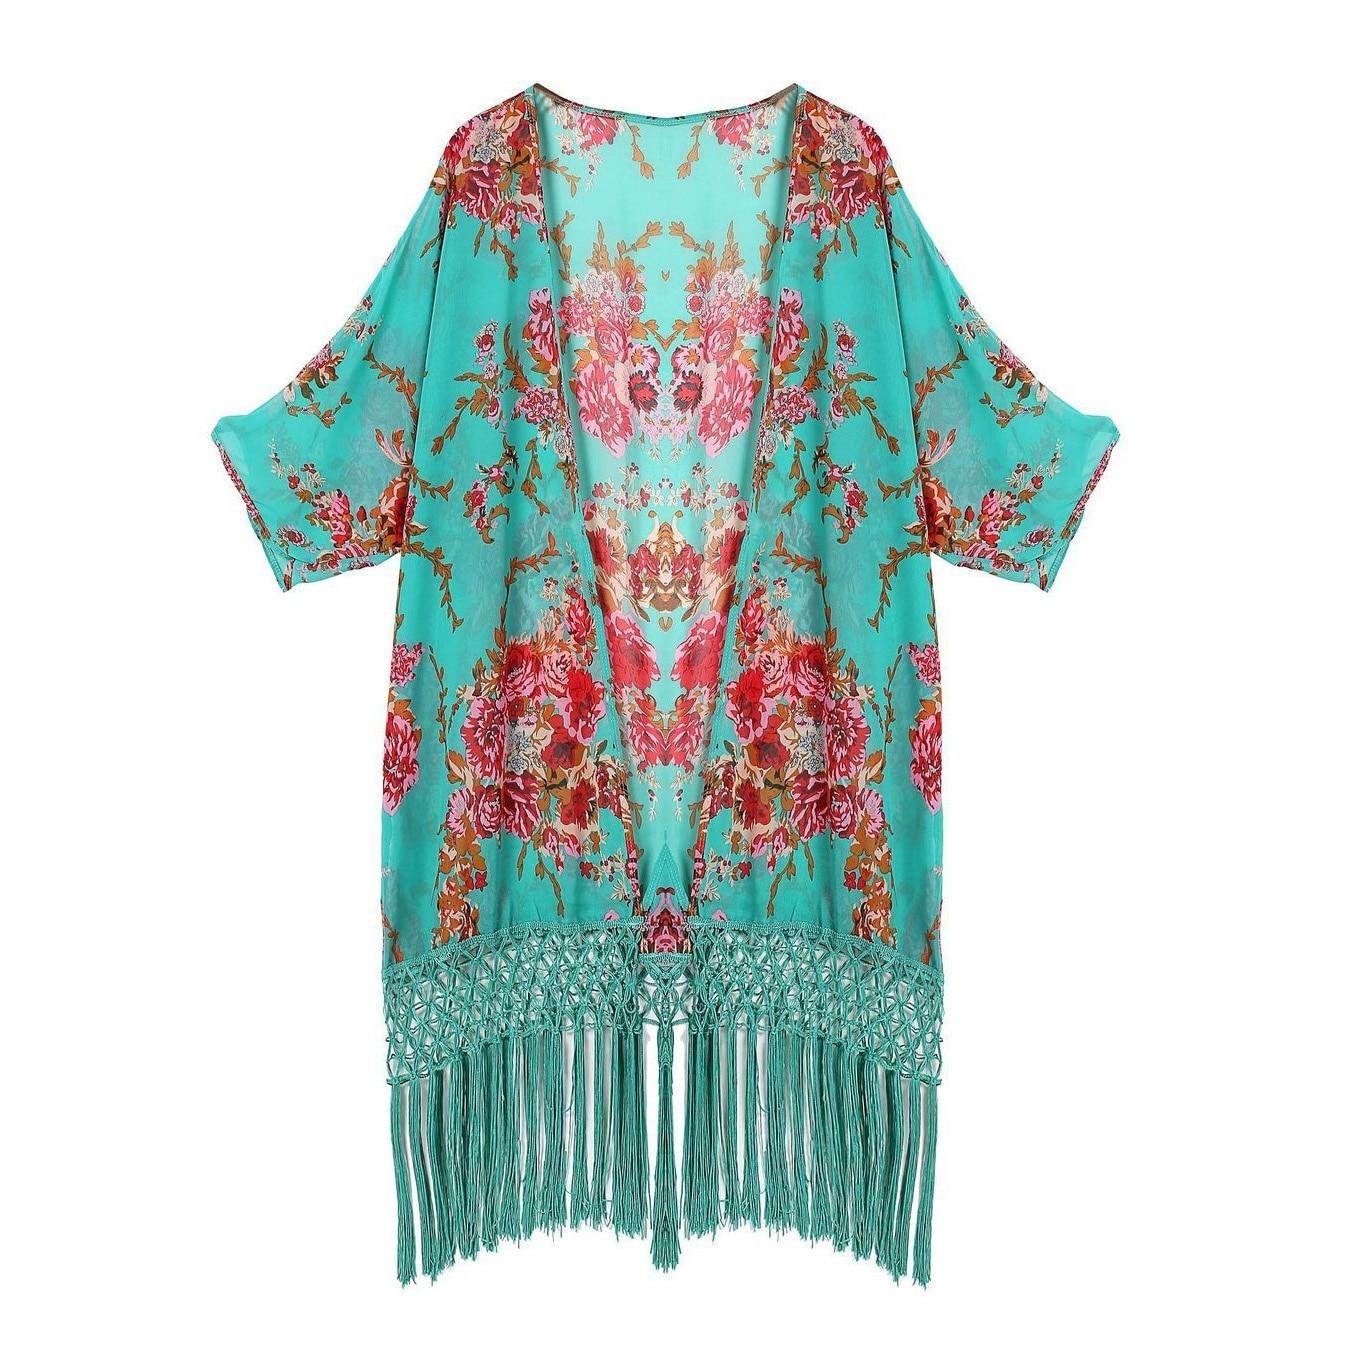 5pcs( Good Deal Womens Swimwear Beachwear Bikini Beach Wear Cover Up Kaftan Summer Shirt Dress<br>